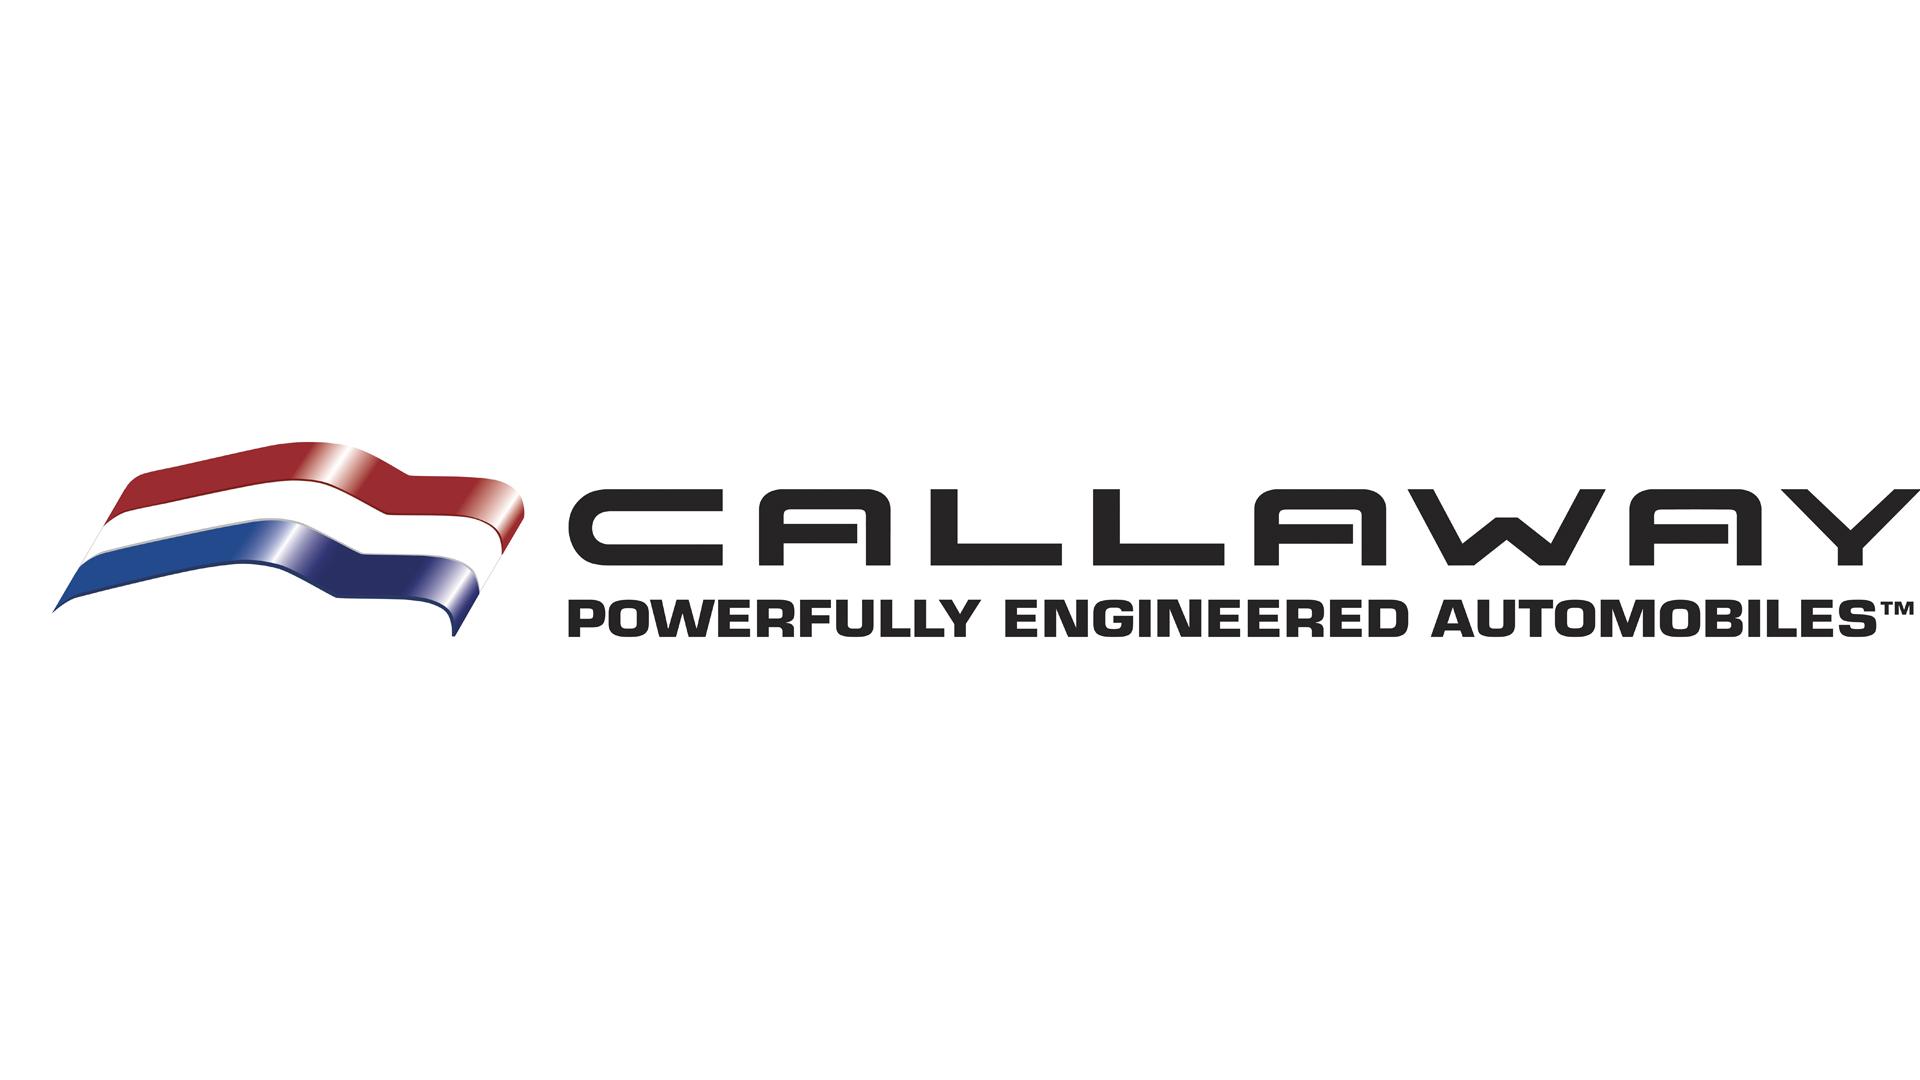 le logo voiture callaway  embleme  sigle lancia